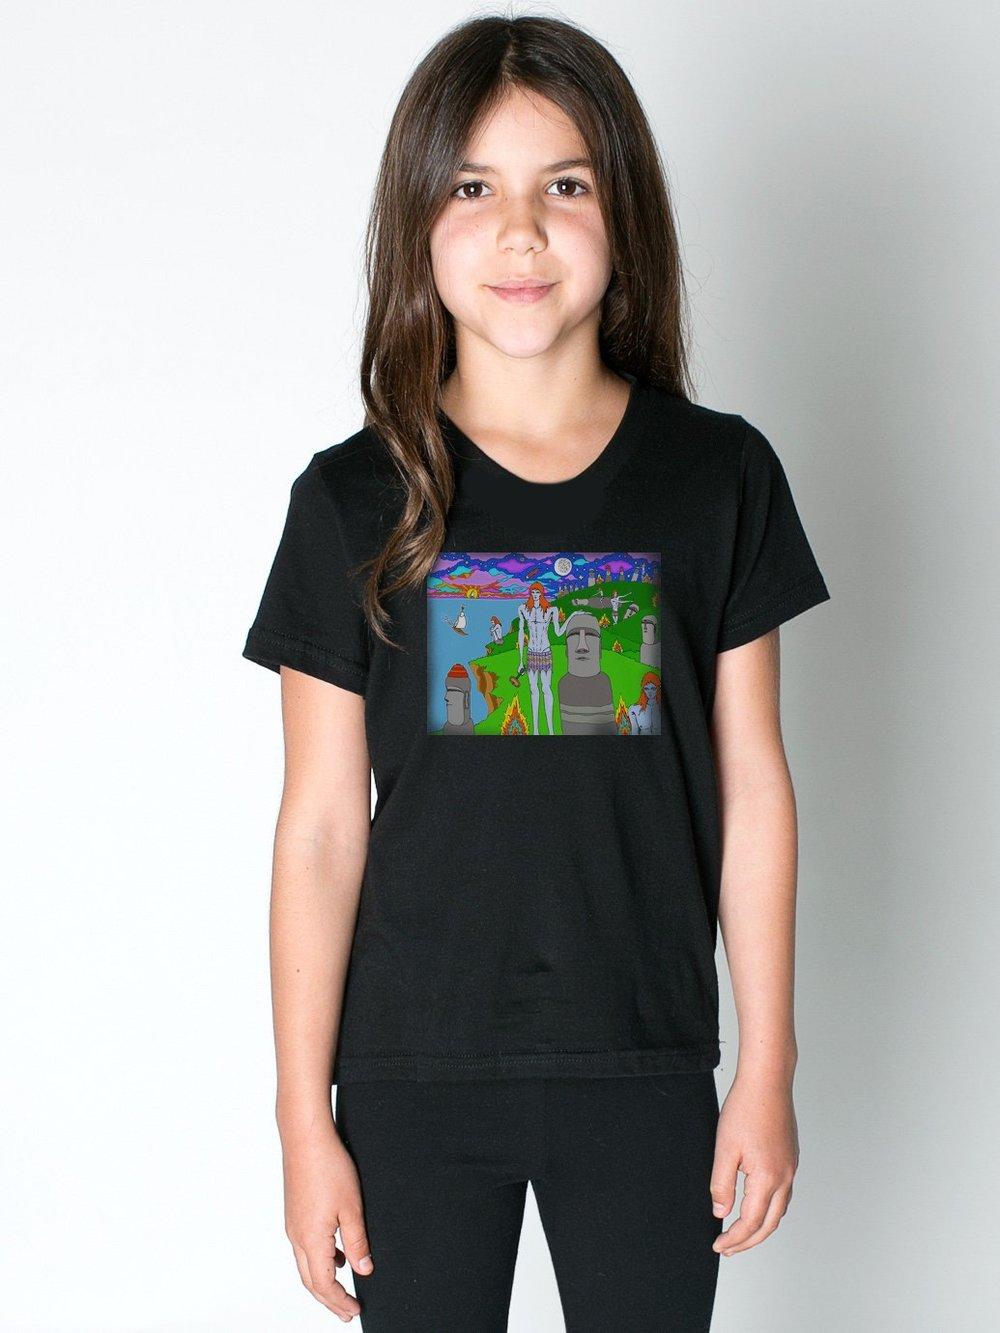 American-Apparel-Kids-Fine-Jersey-VNeck-TShirt-Female-Black copy 9.jpeg